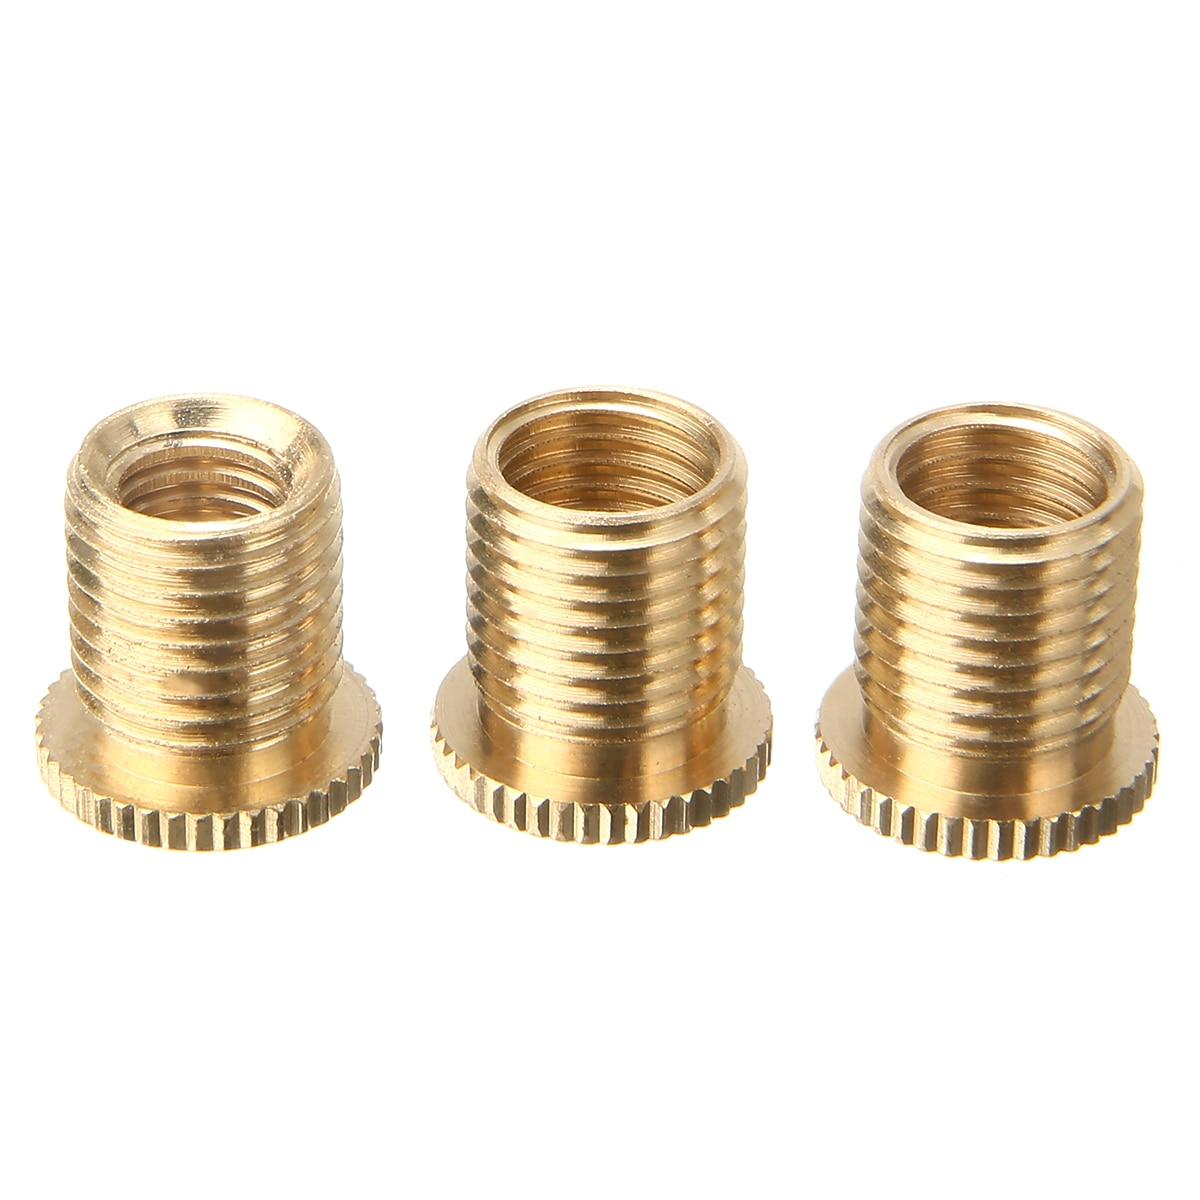 3pcs M10x1.25 M10x1.5 M8x1.25 Car Auto Gear Stick Shift Shifter Knob Head Thread Screw Adapter Aluminum Alloy Accessories Parts